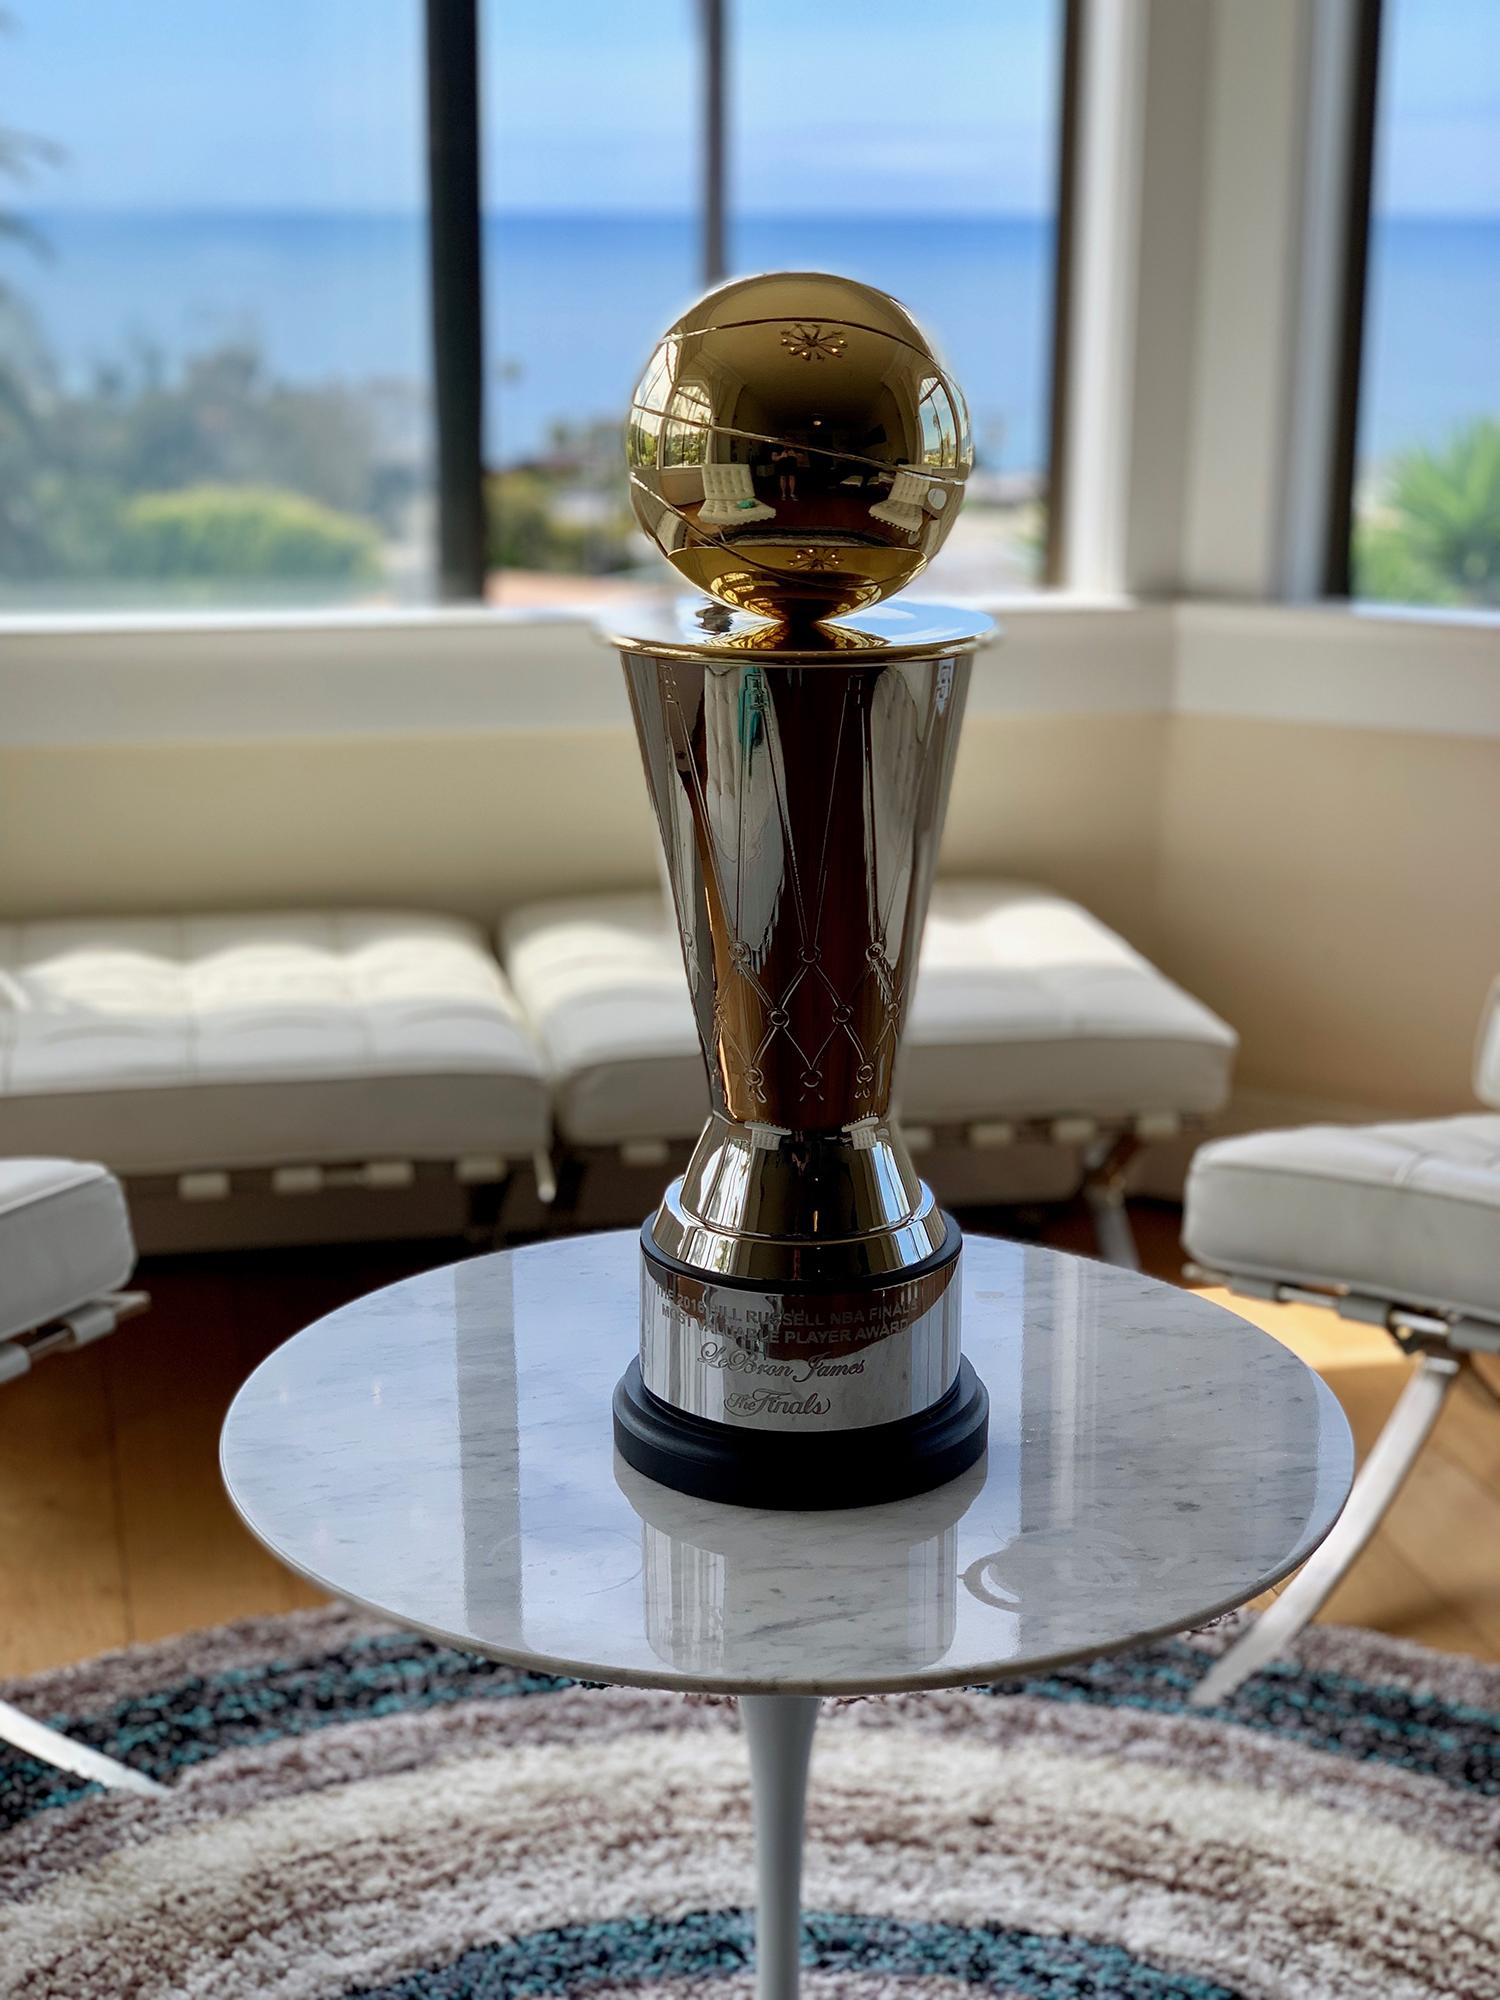 Replica NBA Finals MVP Award Trophy - Sport Fantasic